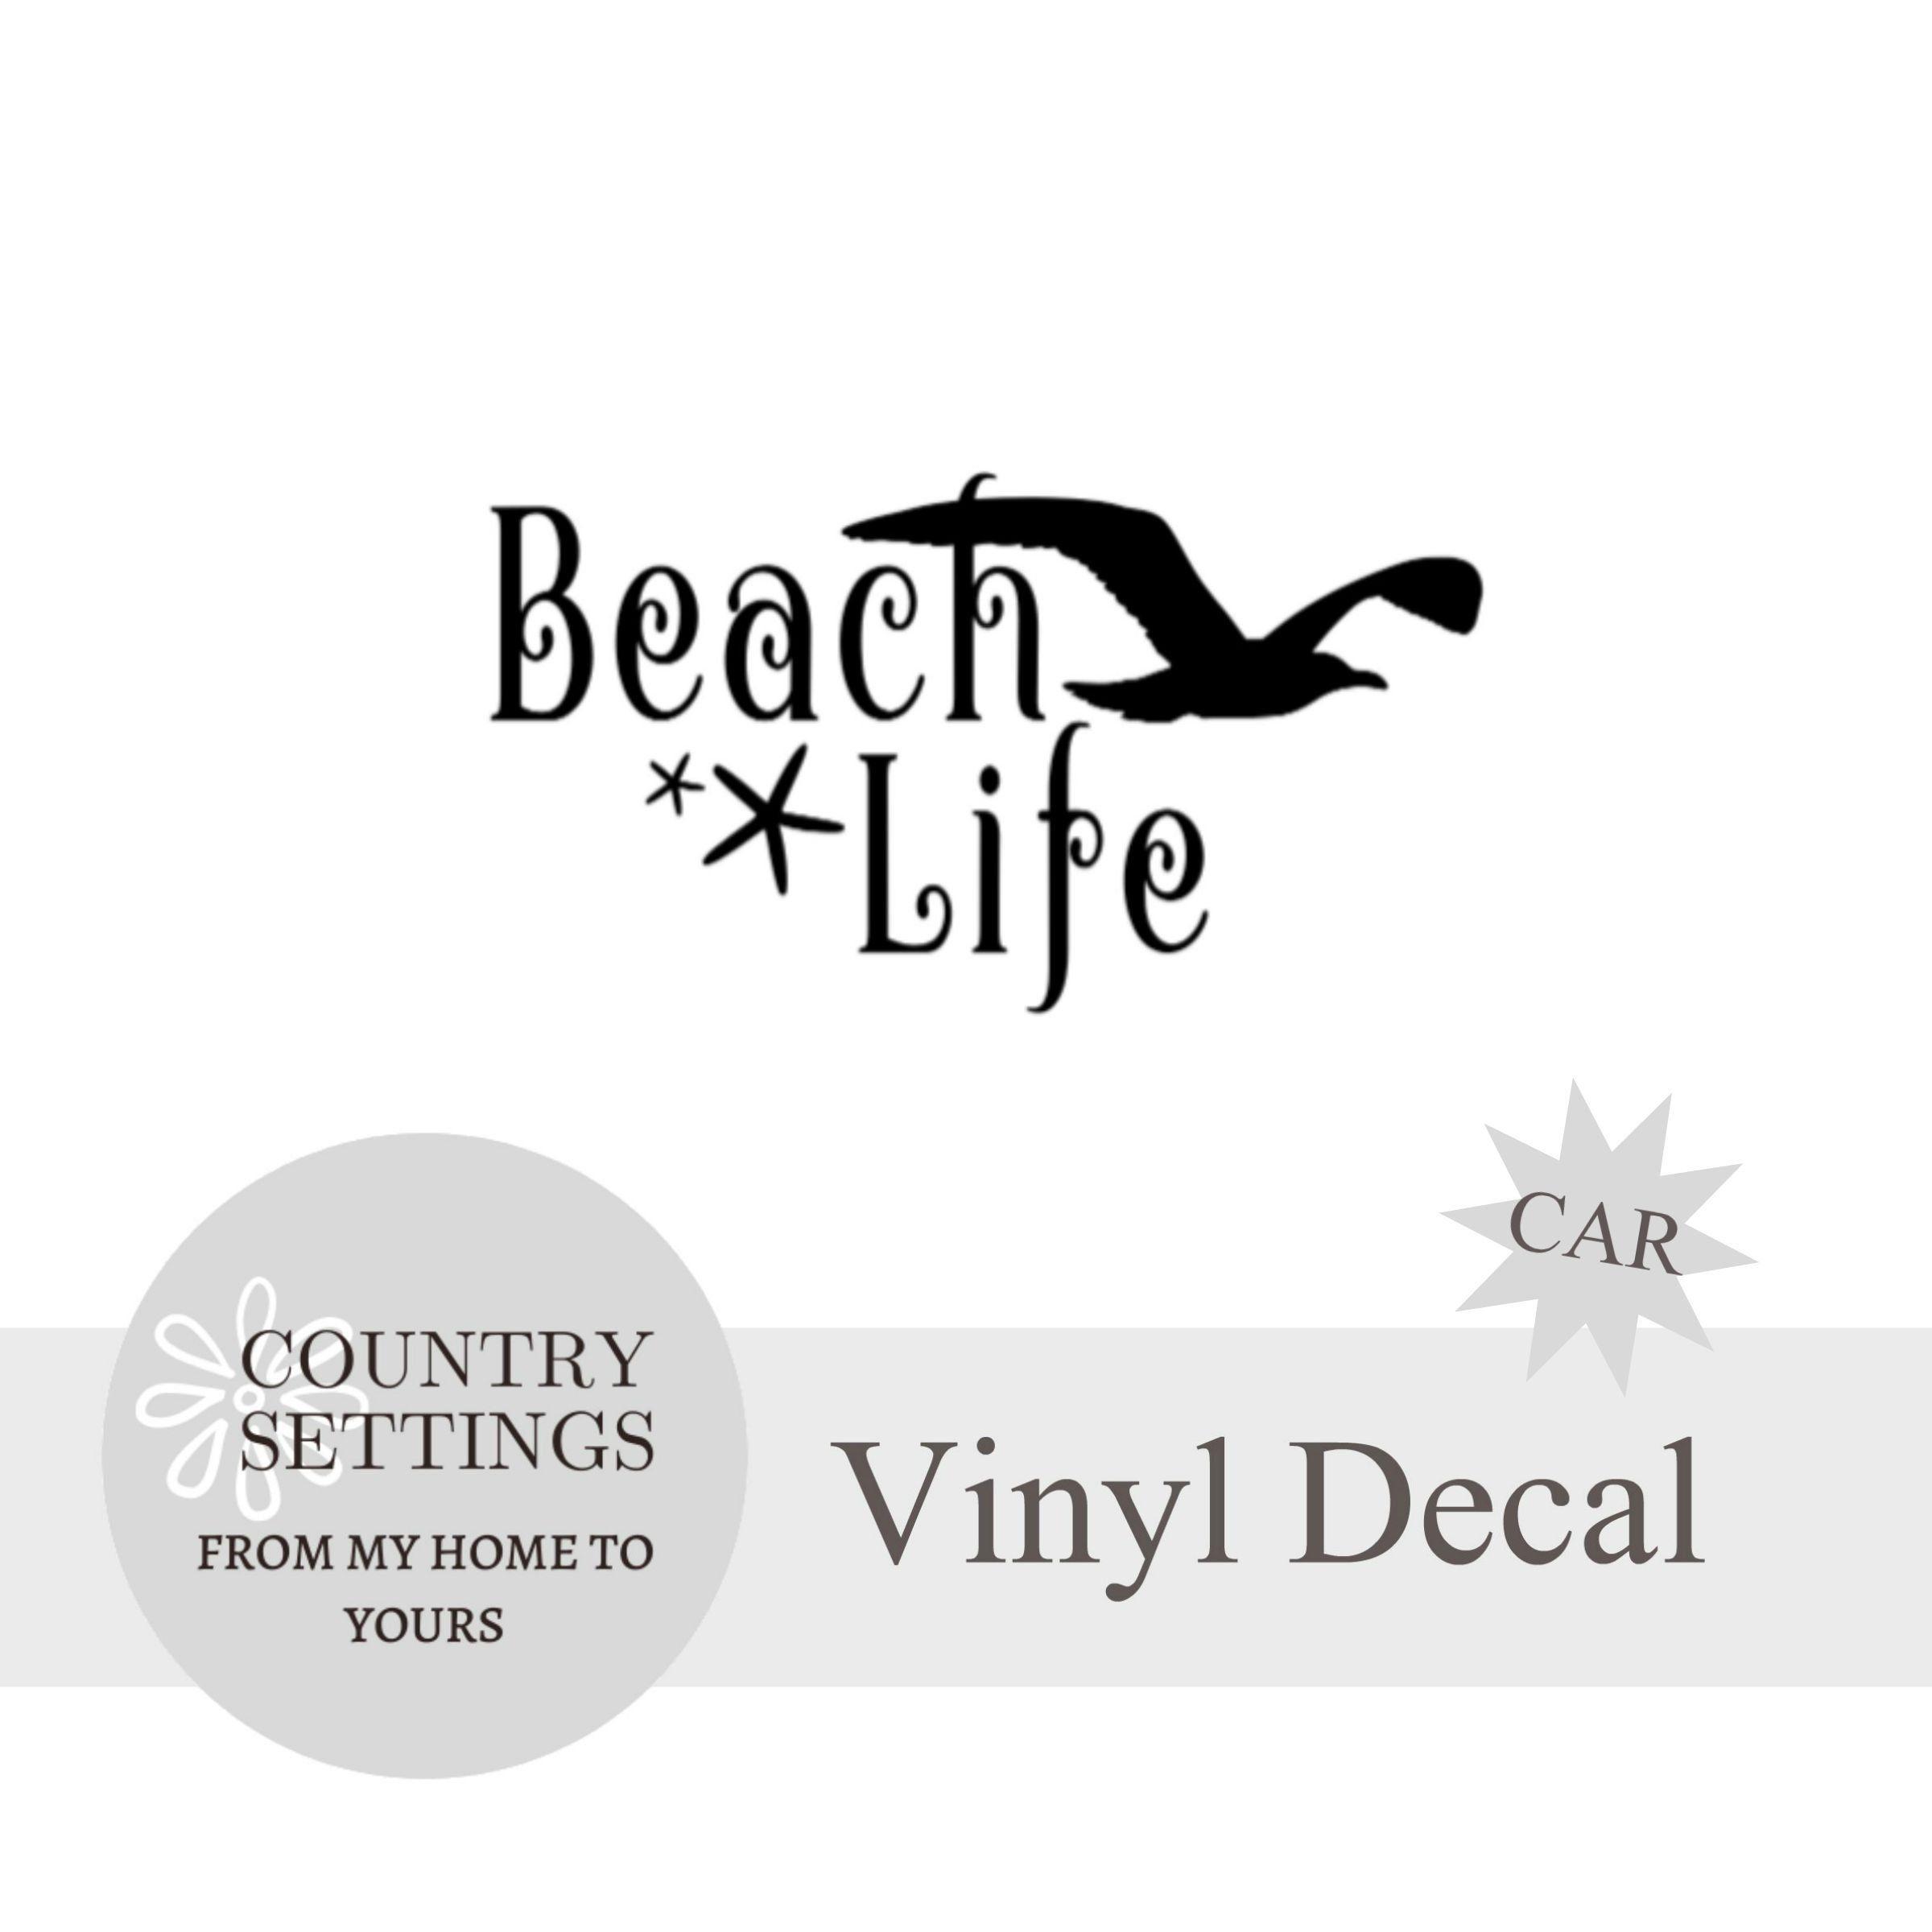 Beach Life Vinyl Decal Car Decals Beach Decals In 2020 Vinyl